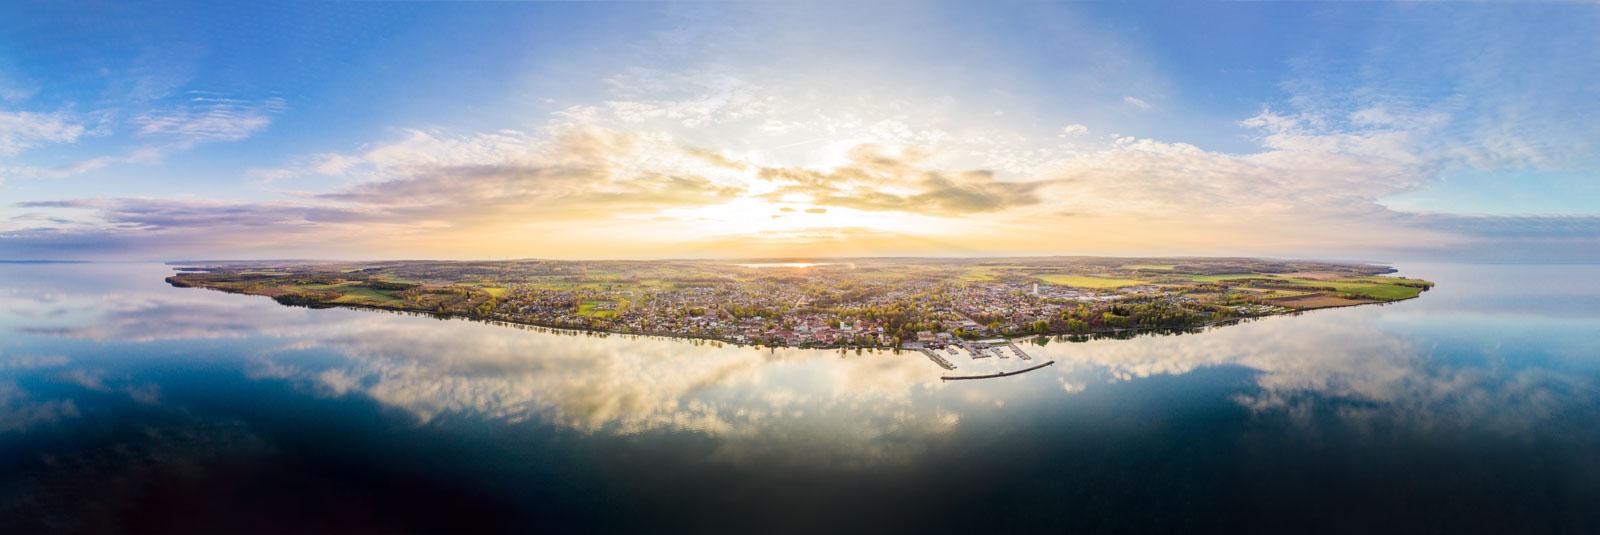 Aerial panorama xxl – Lake Vättern, Hjo, Sweden